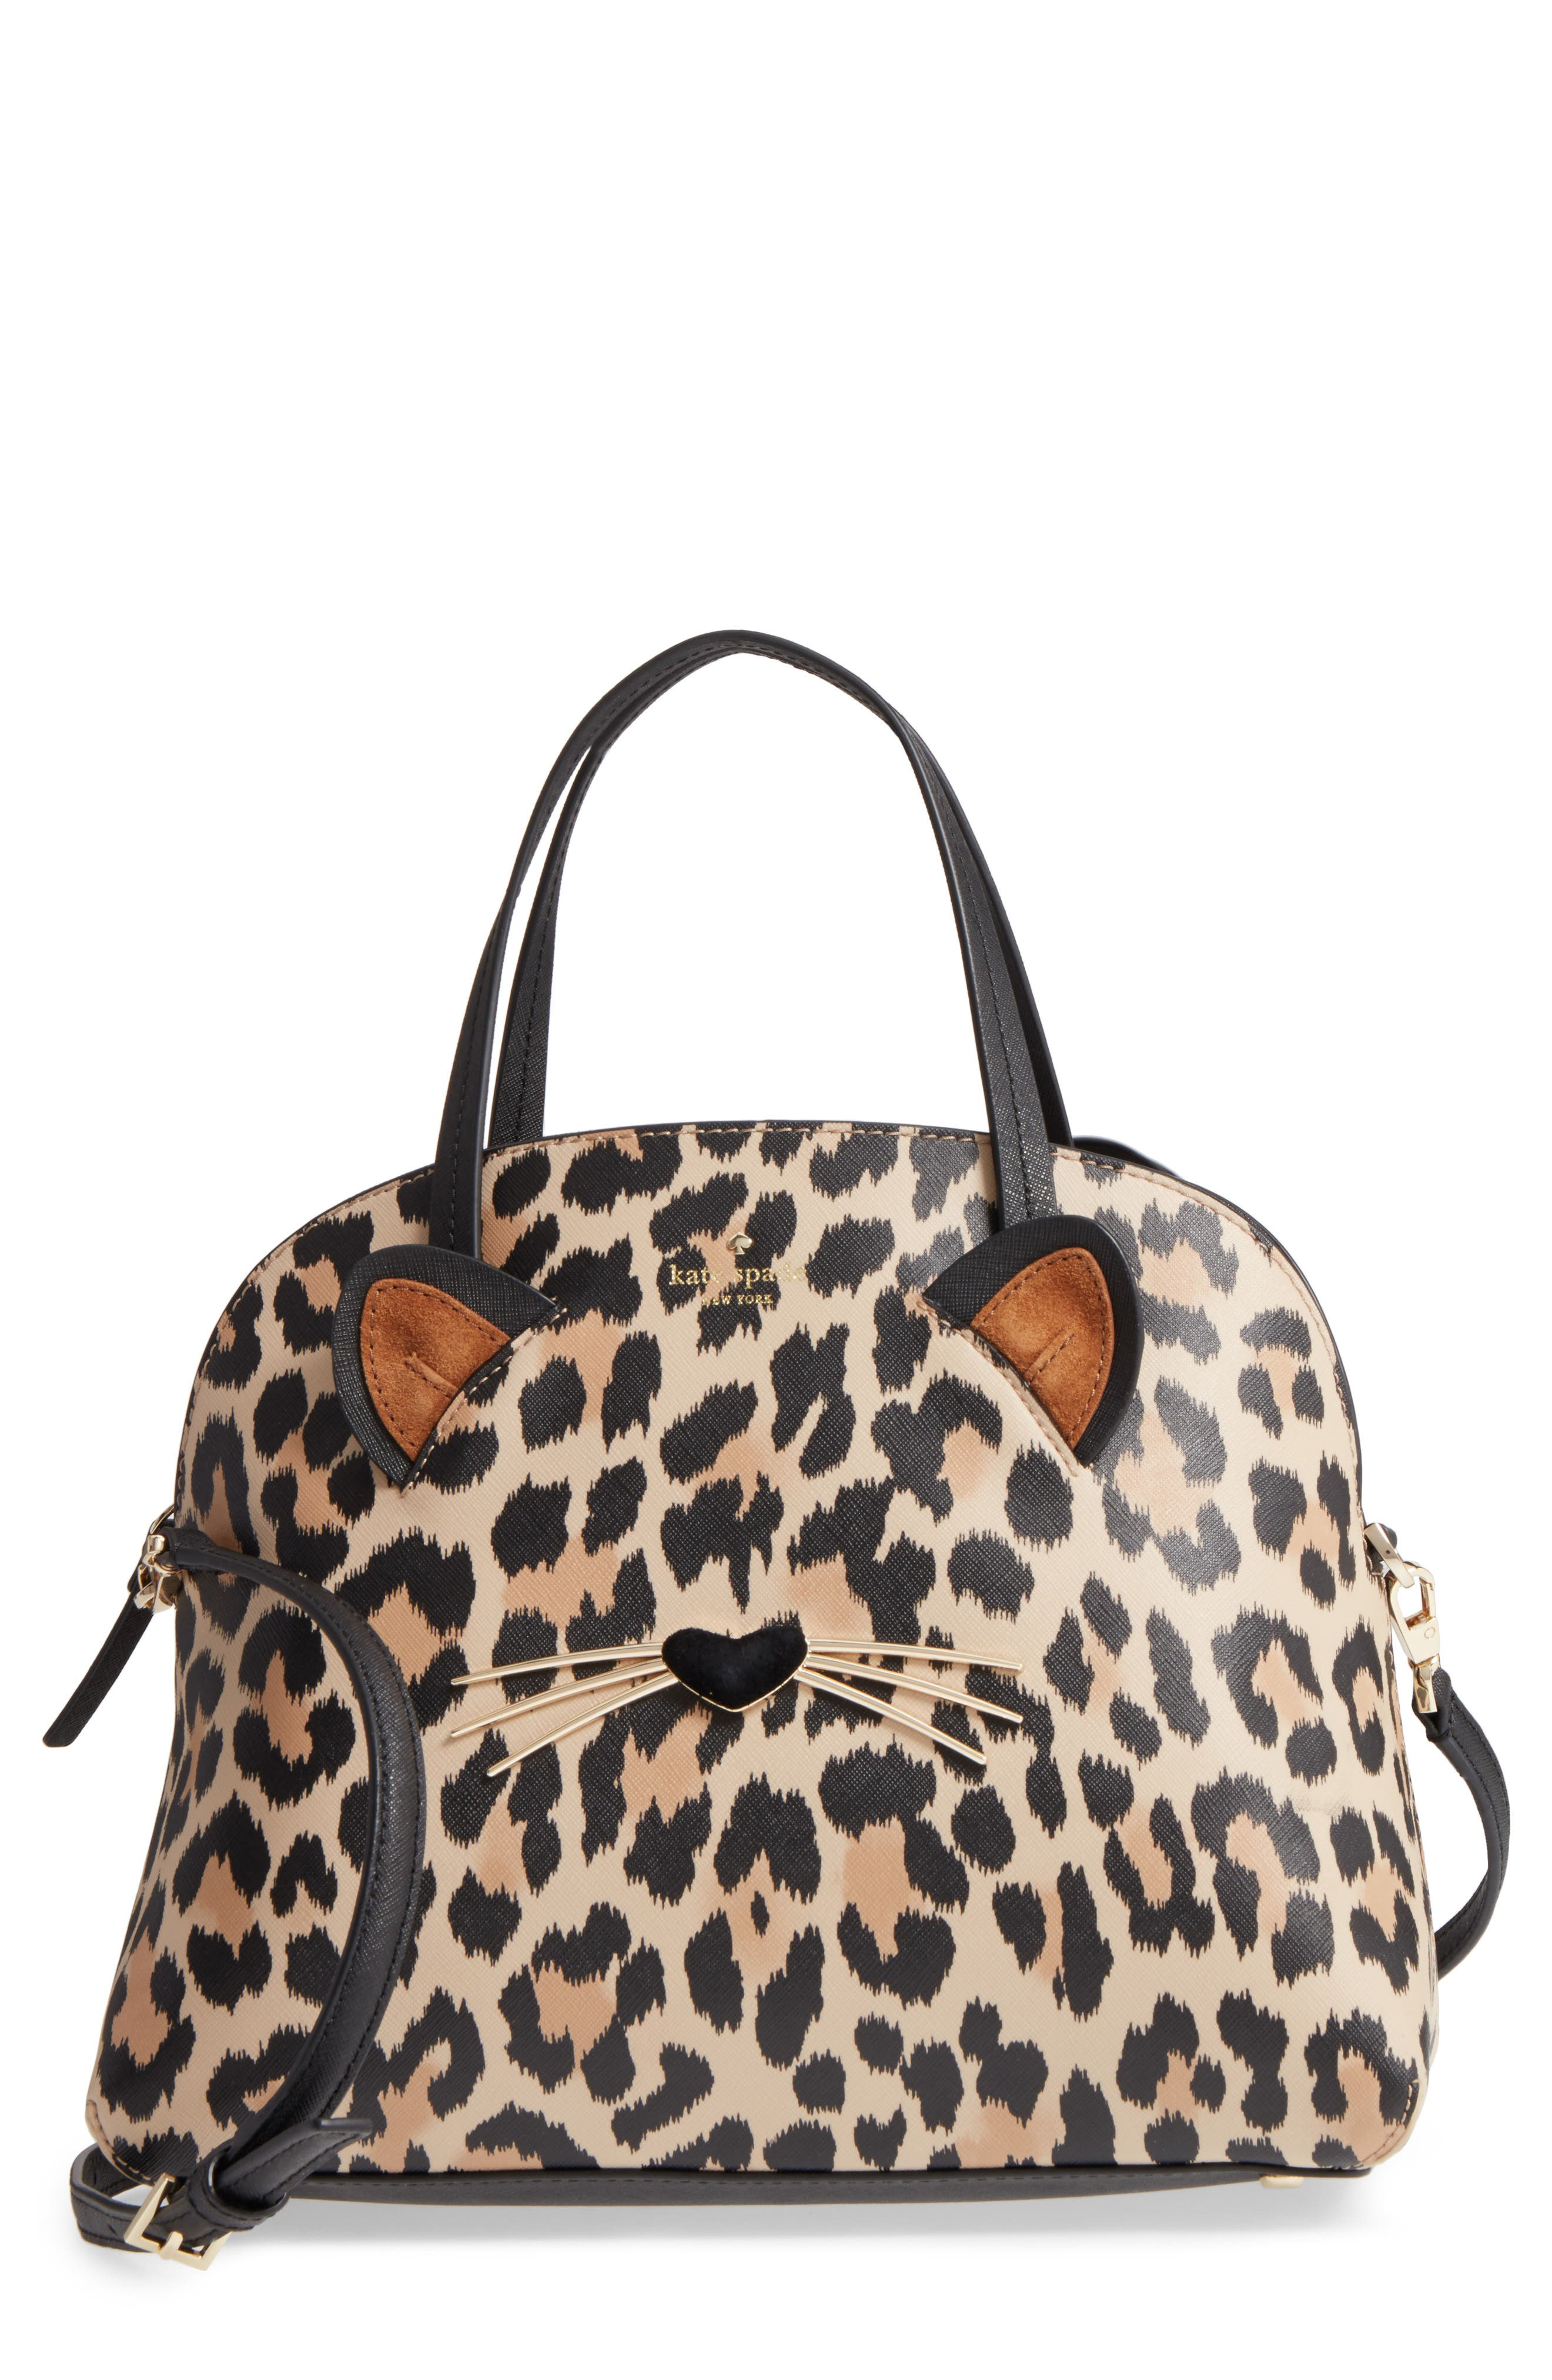 run wild - lottie satchel,                         Main,                         color, 200